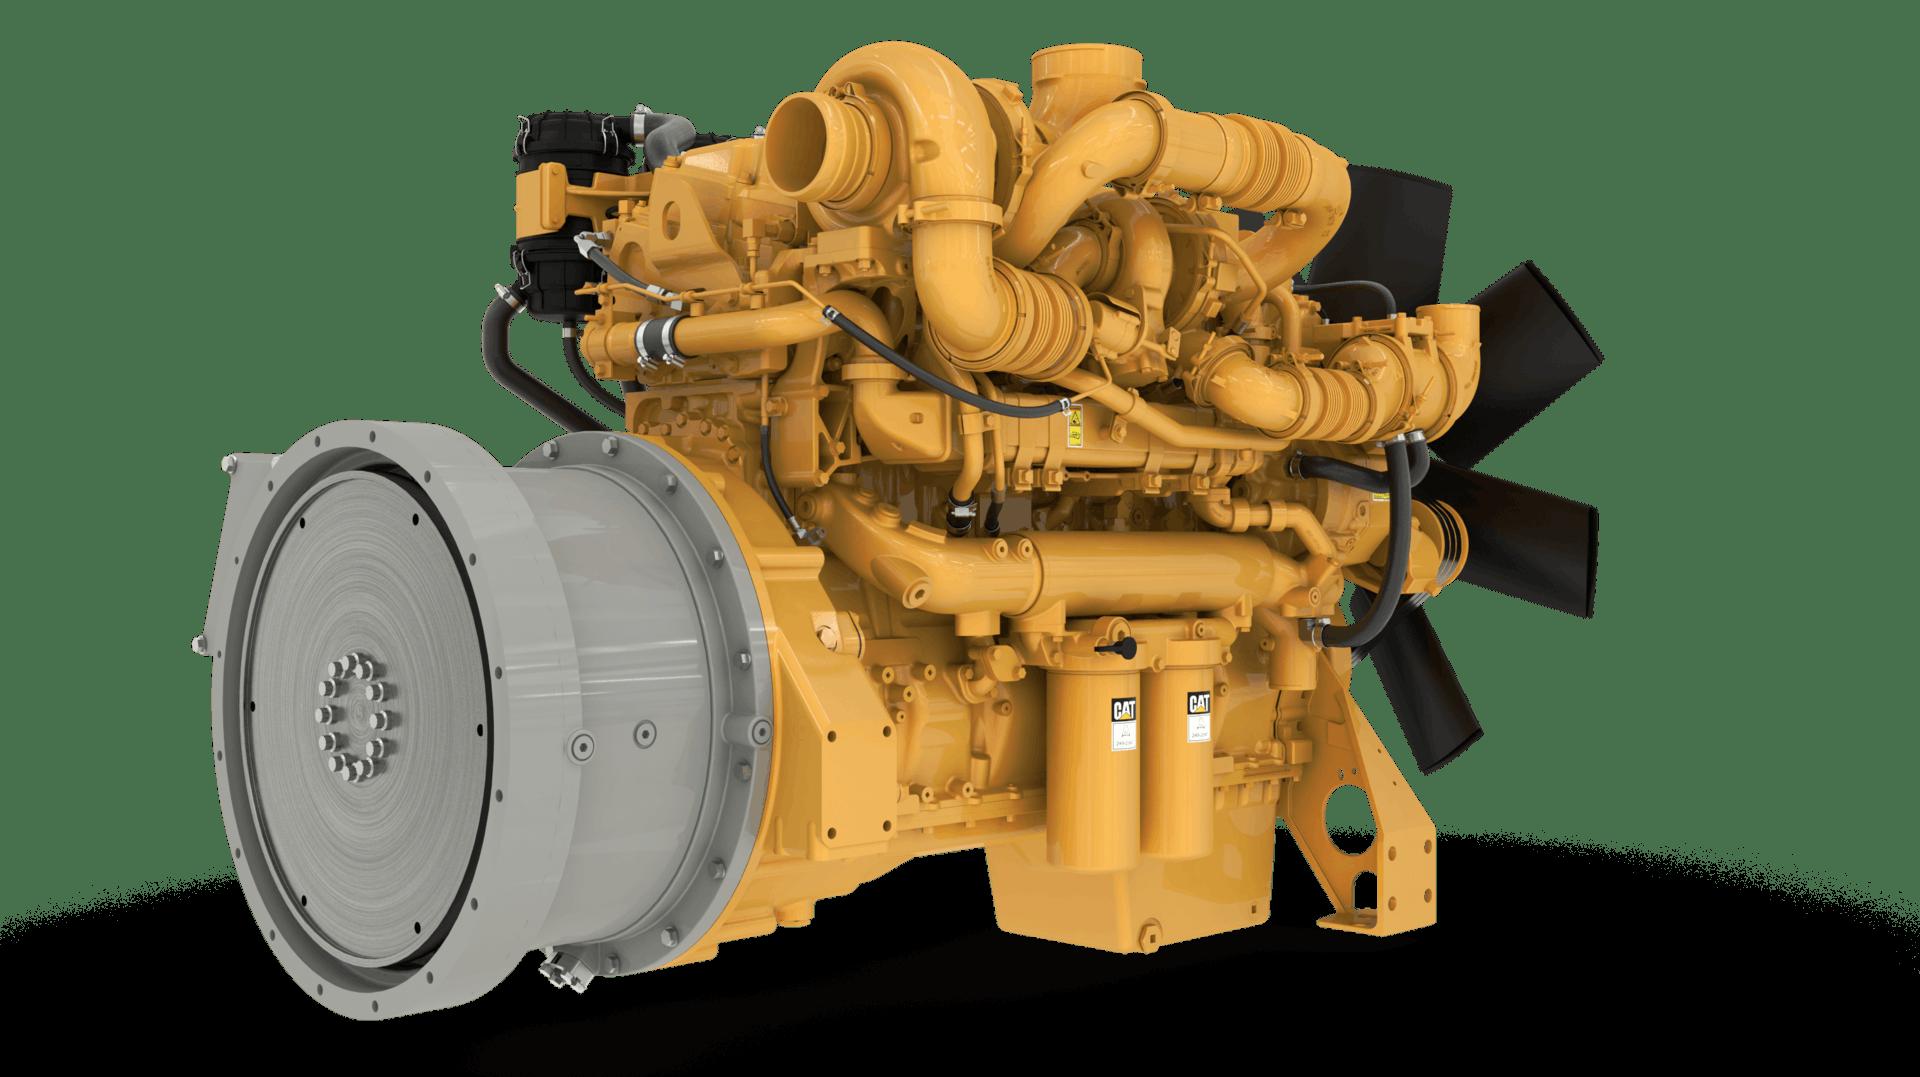 Caterpillar Introduces Hybrid Engine Concept | OEM Off-Highway